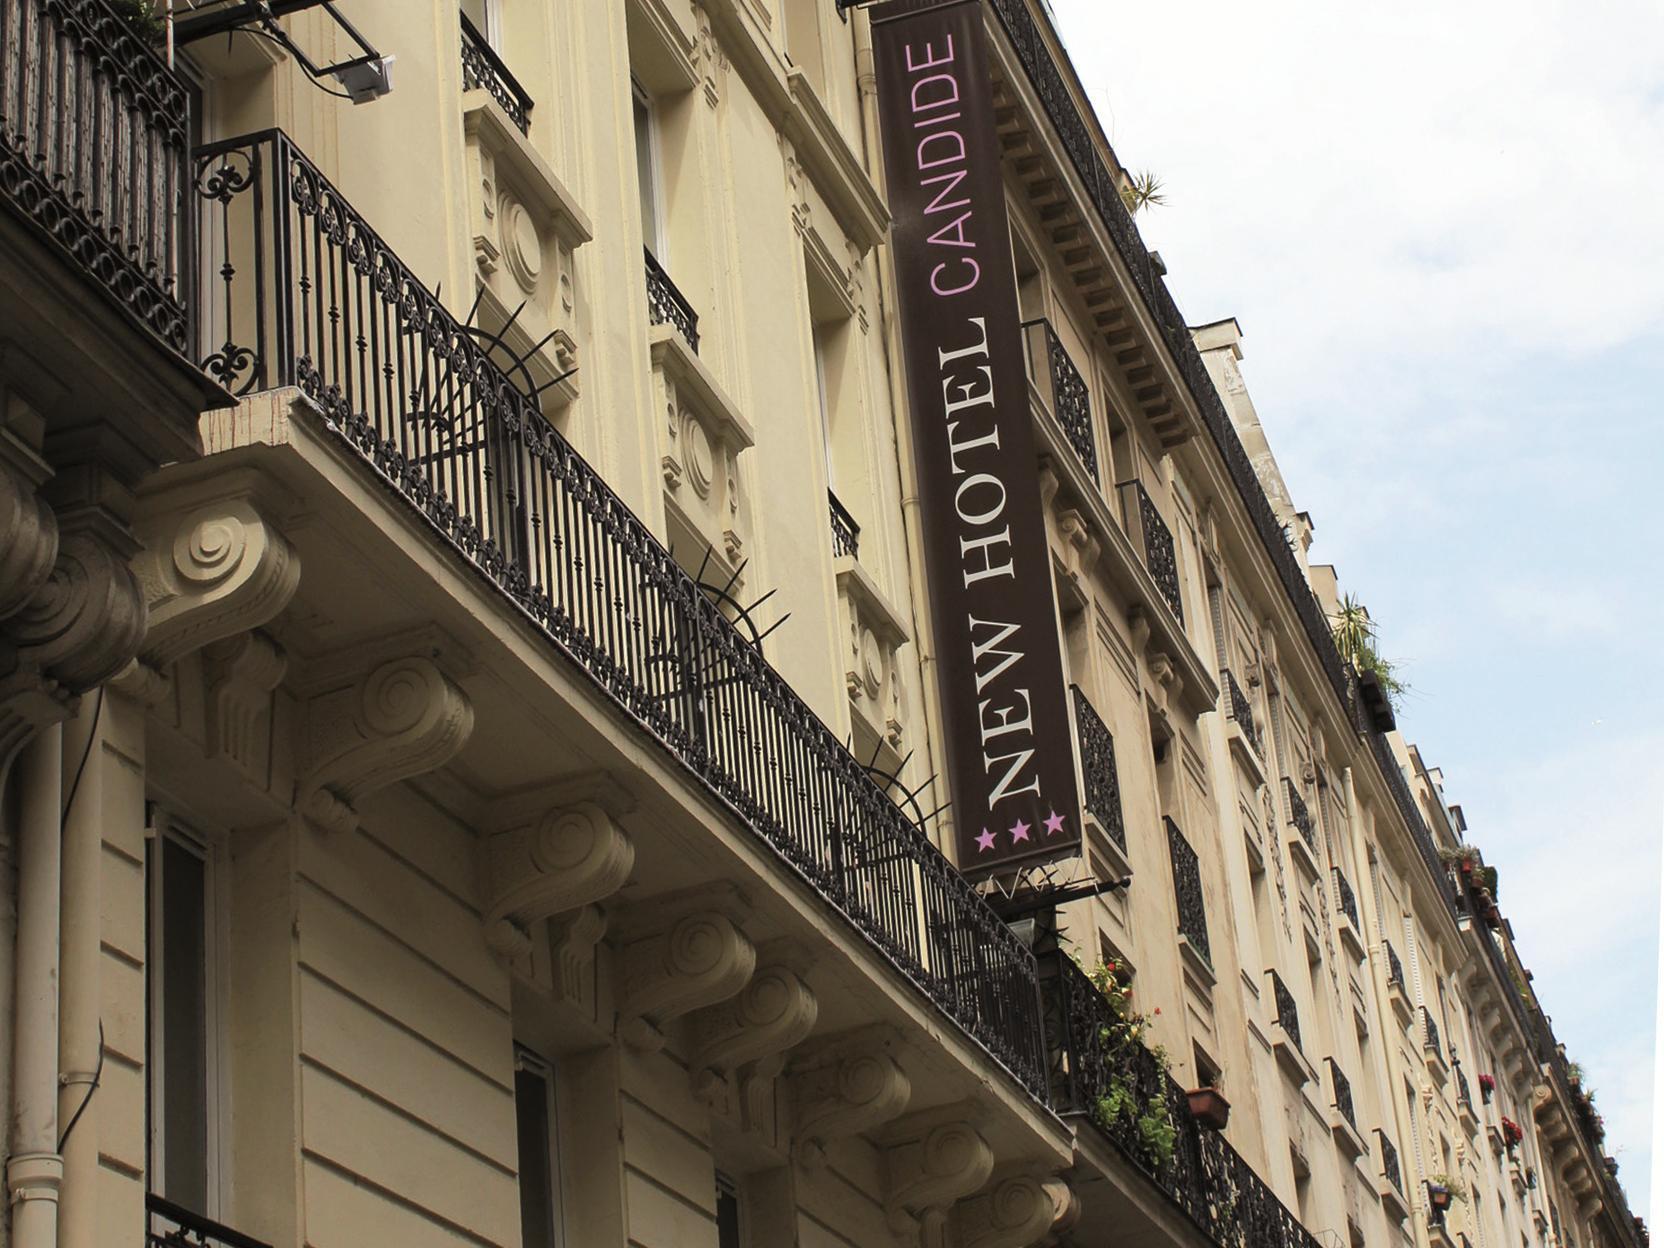 New Hotel Candide - Hotell och Boende i Frankrike i Europa